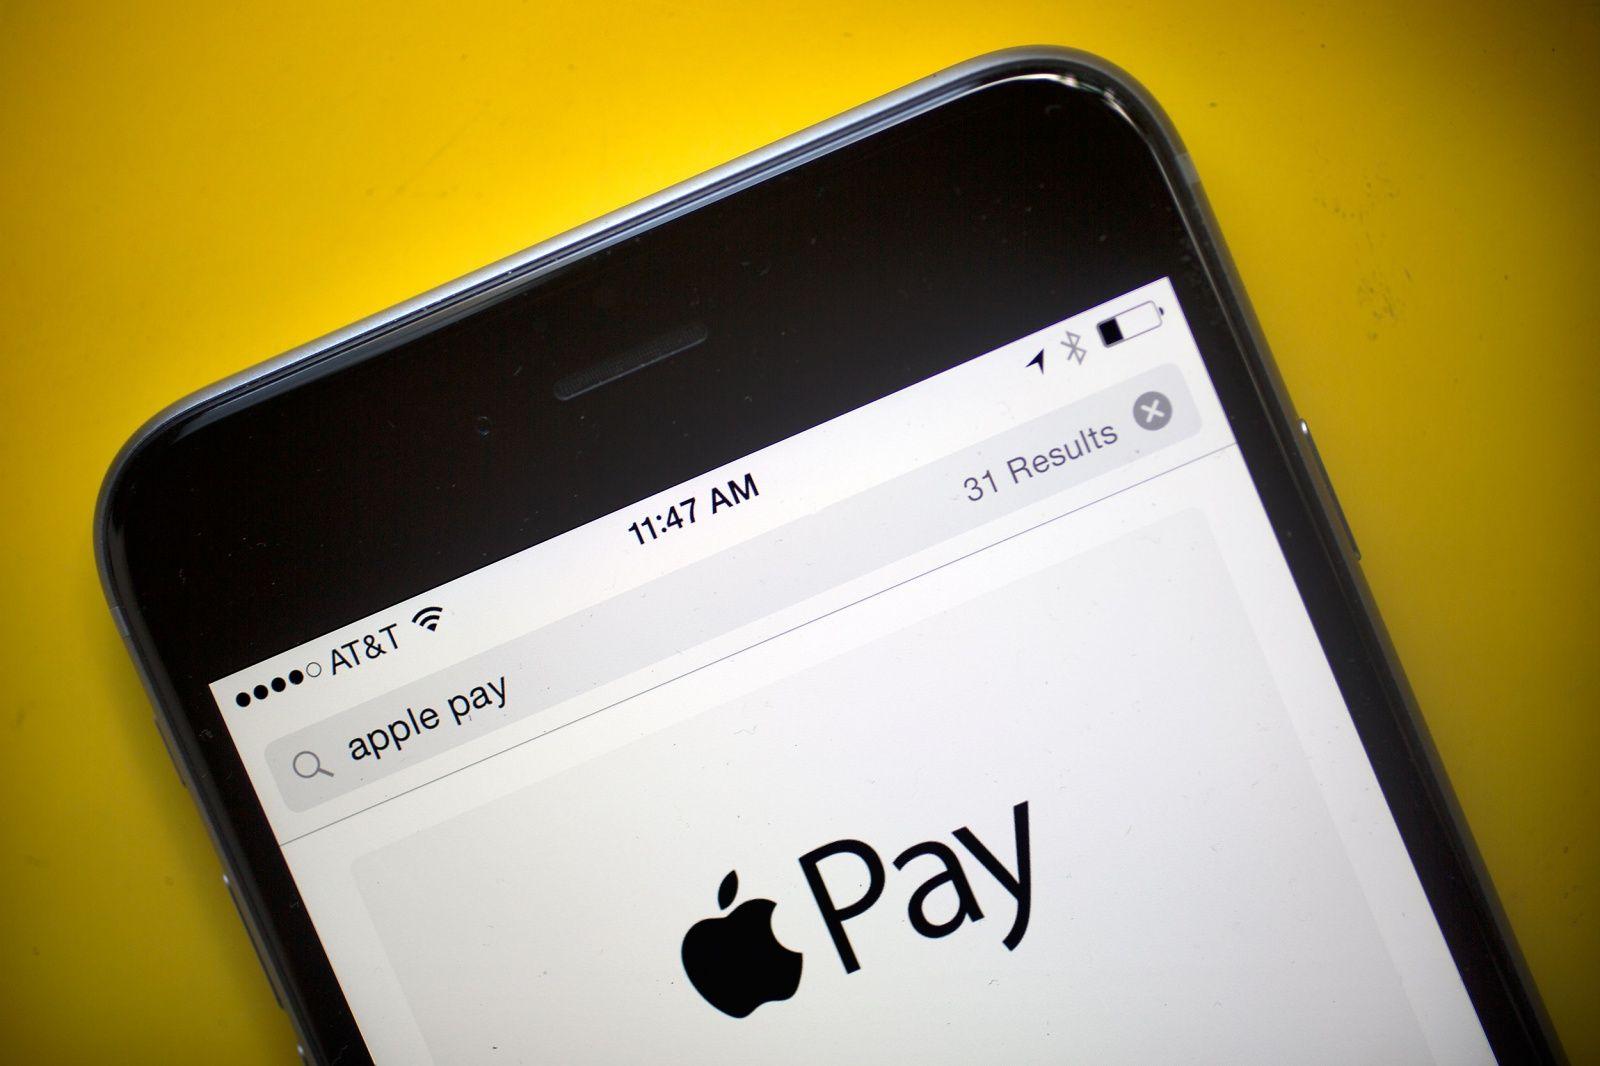 Apple Pay Bir Ülkede Daha Aktif Oldu! Apple Pay Apple Pay Bir Ülkede Daha Aktif Oldu! apple pay p2p